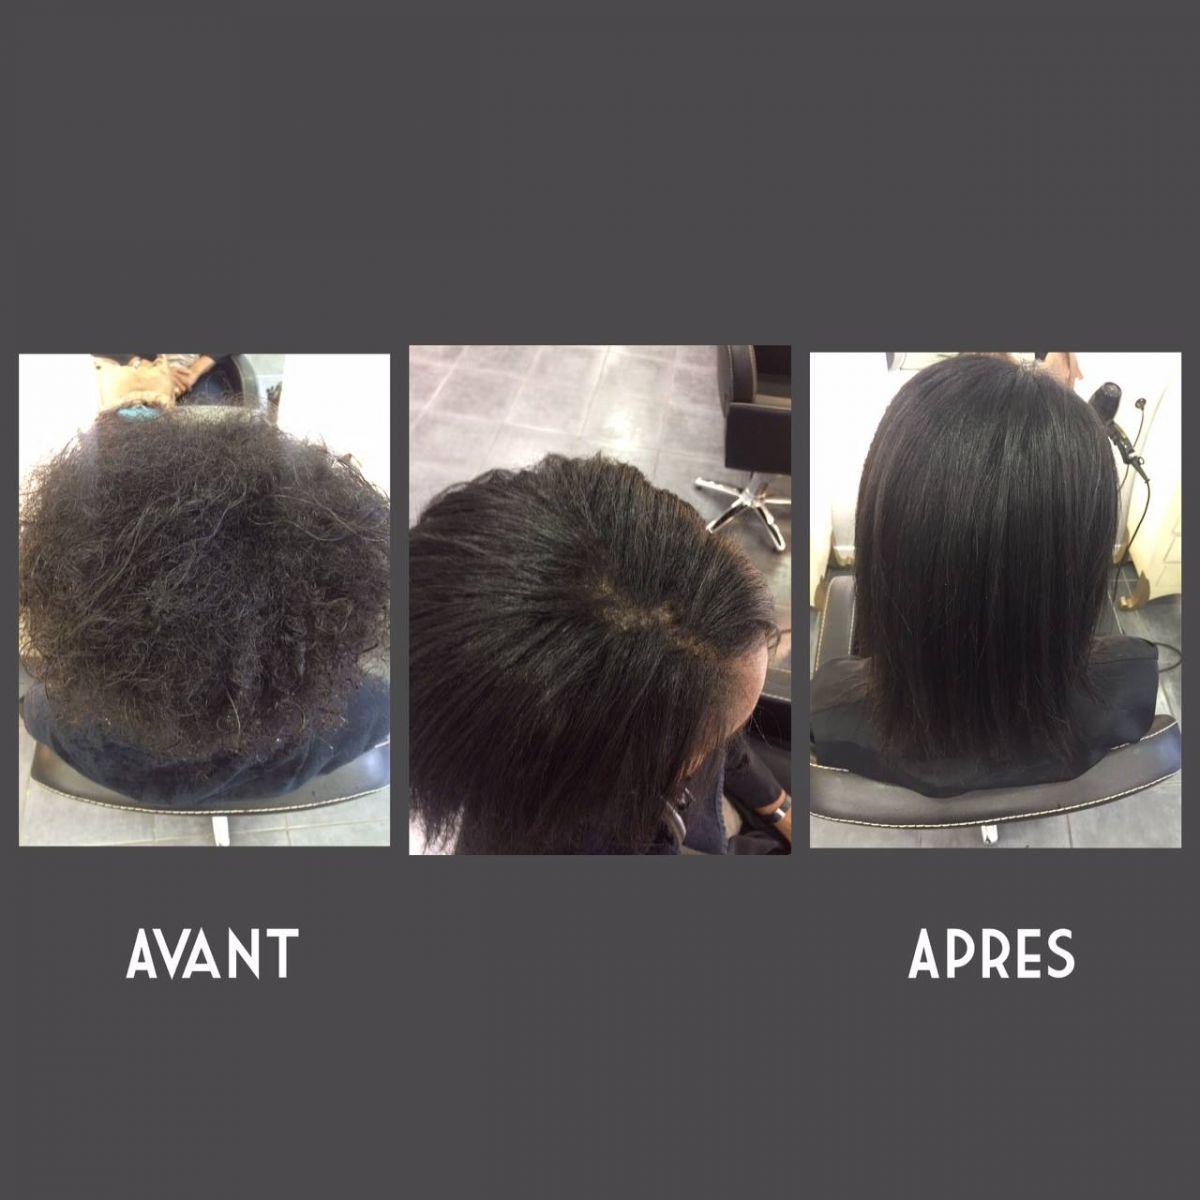 taninoplastie enzymothrapy marseille au salon louna rose coiffure - Coloration Pas Cher Coiffeur